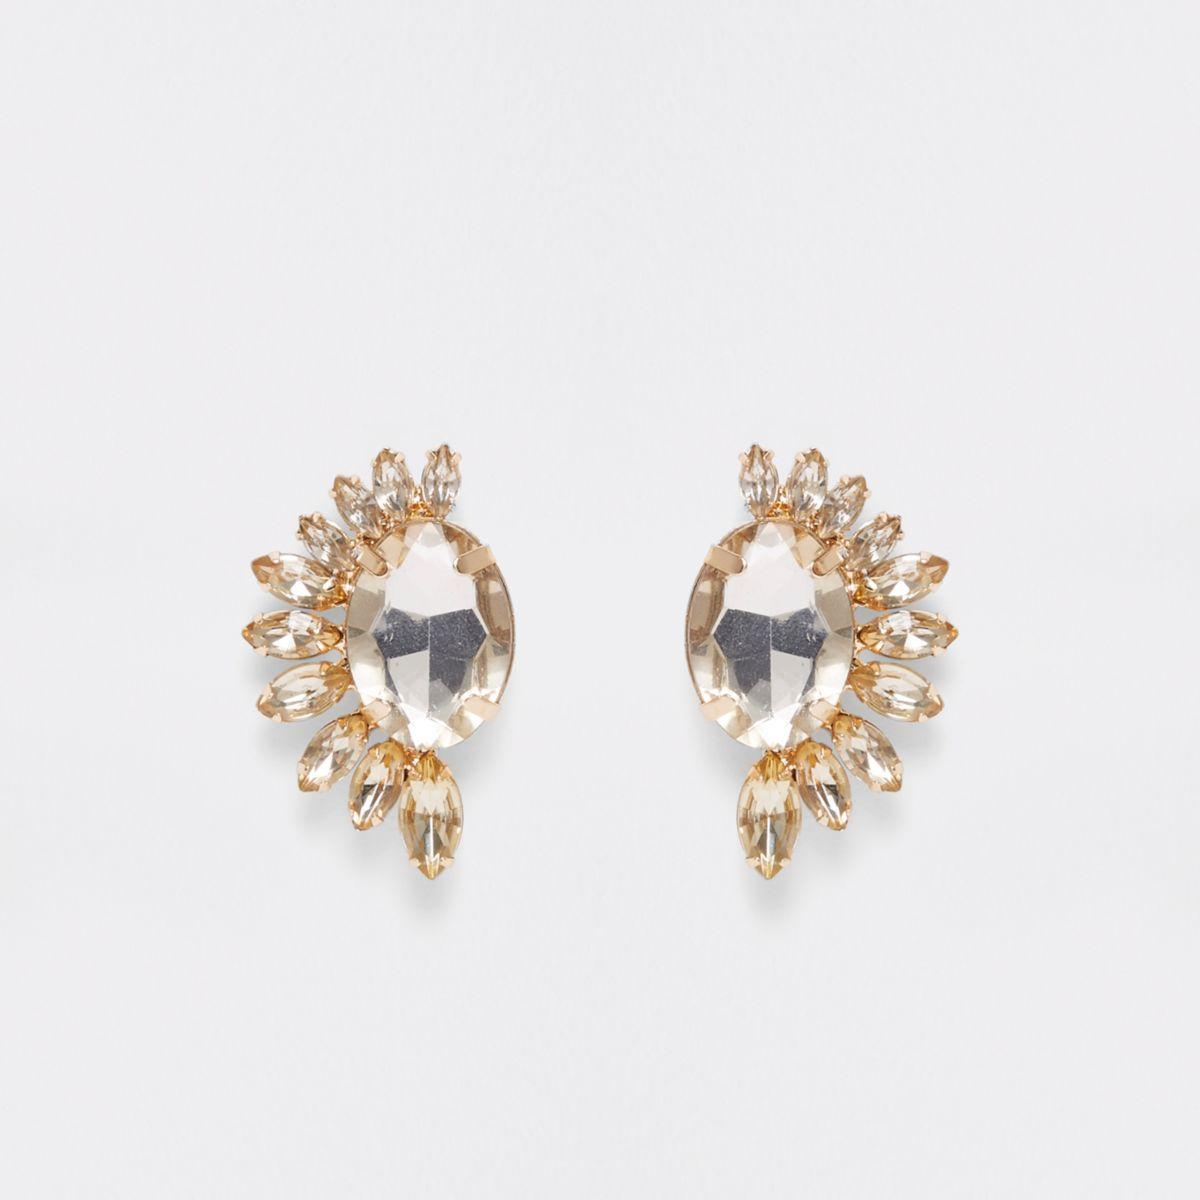 Gold tone crescent stone stud earrings